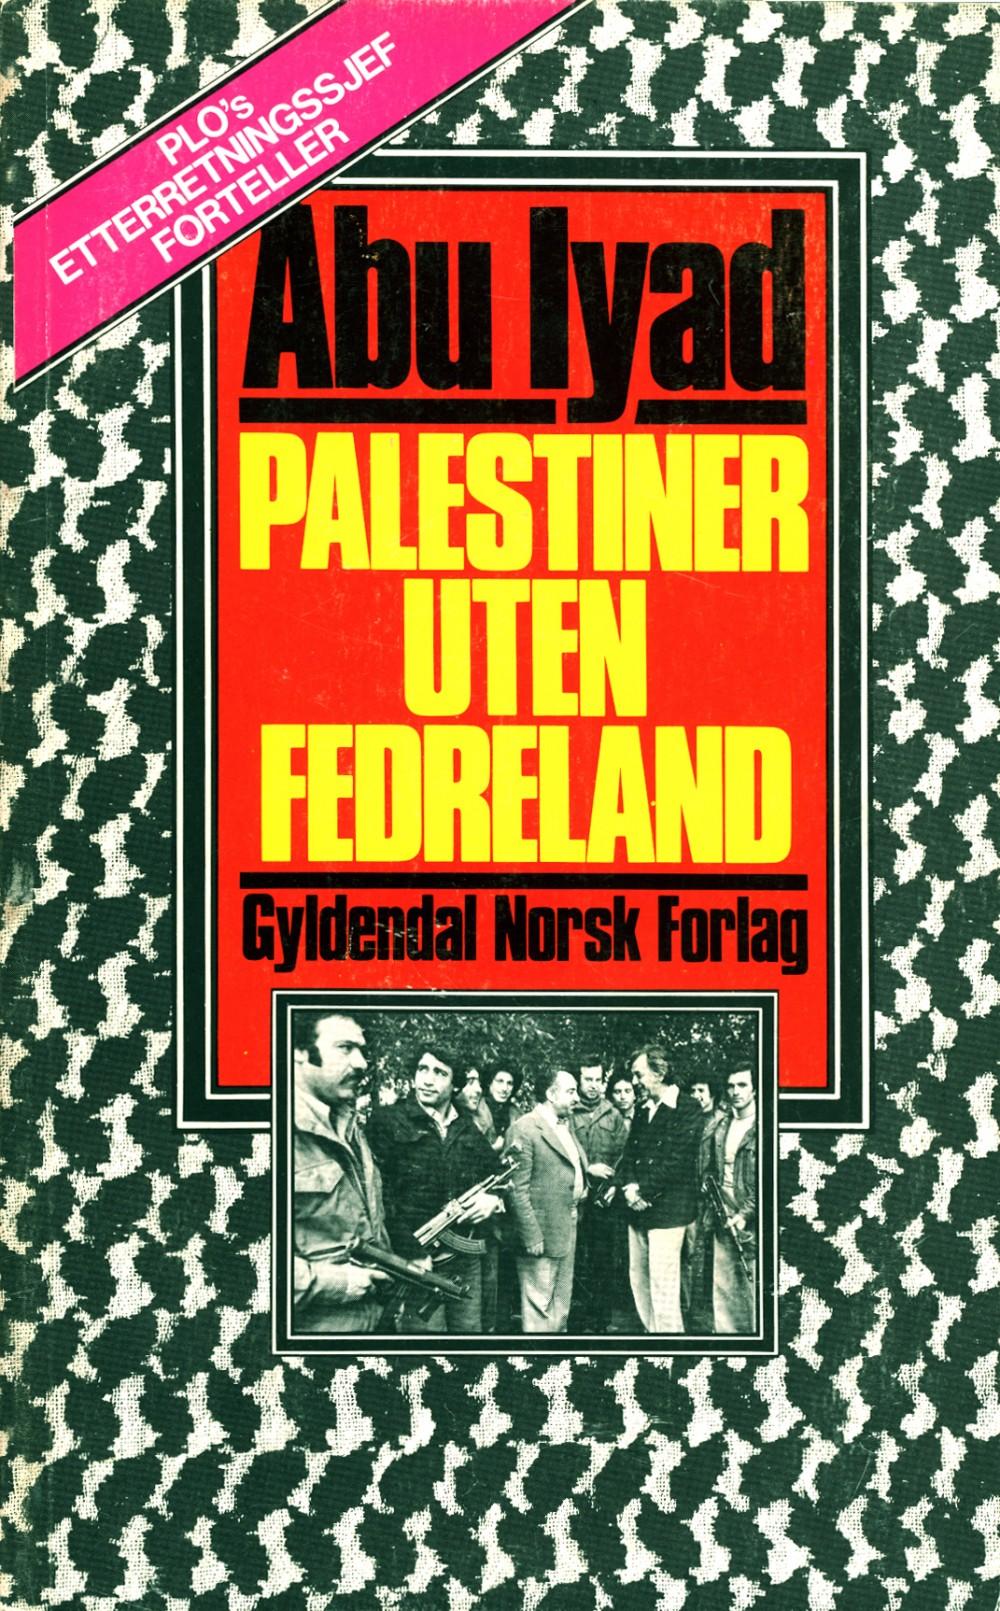 Abu Iyad: Palestiner uten fedreland - PLOs etterretningssjef forteller